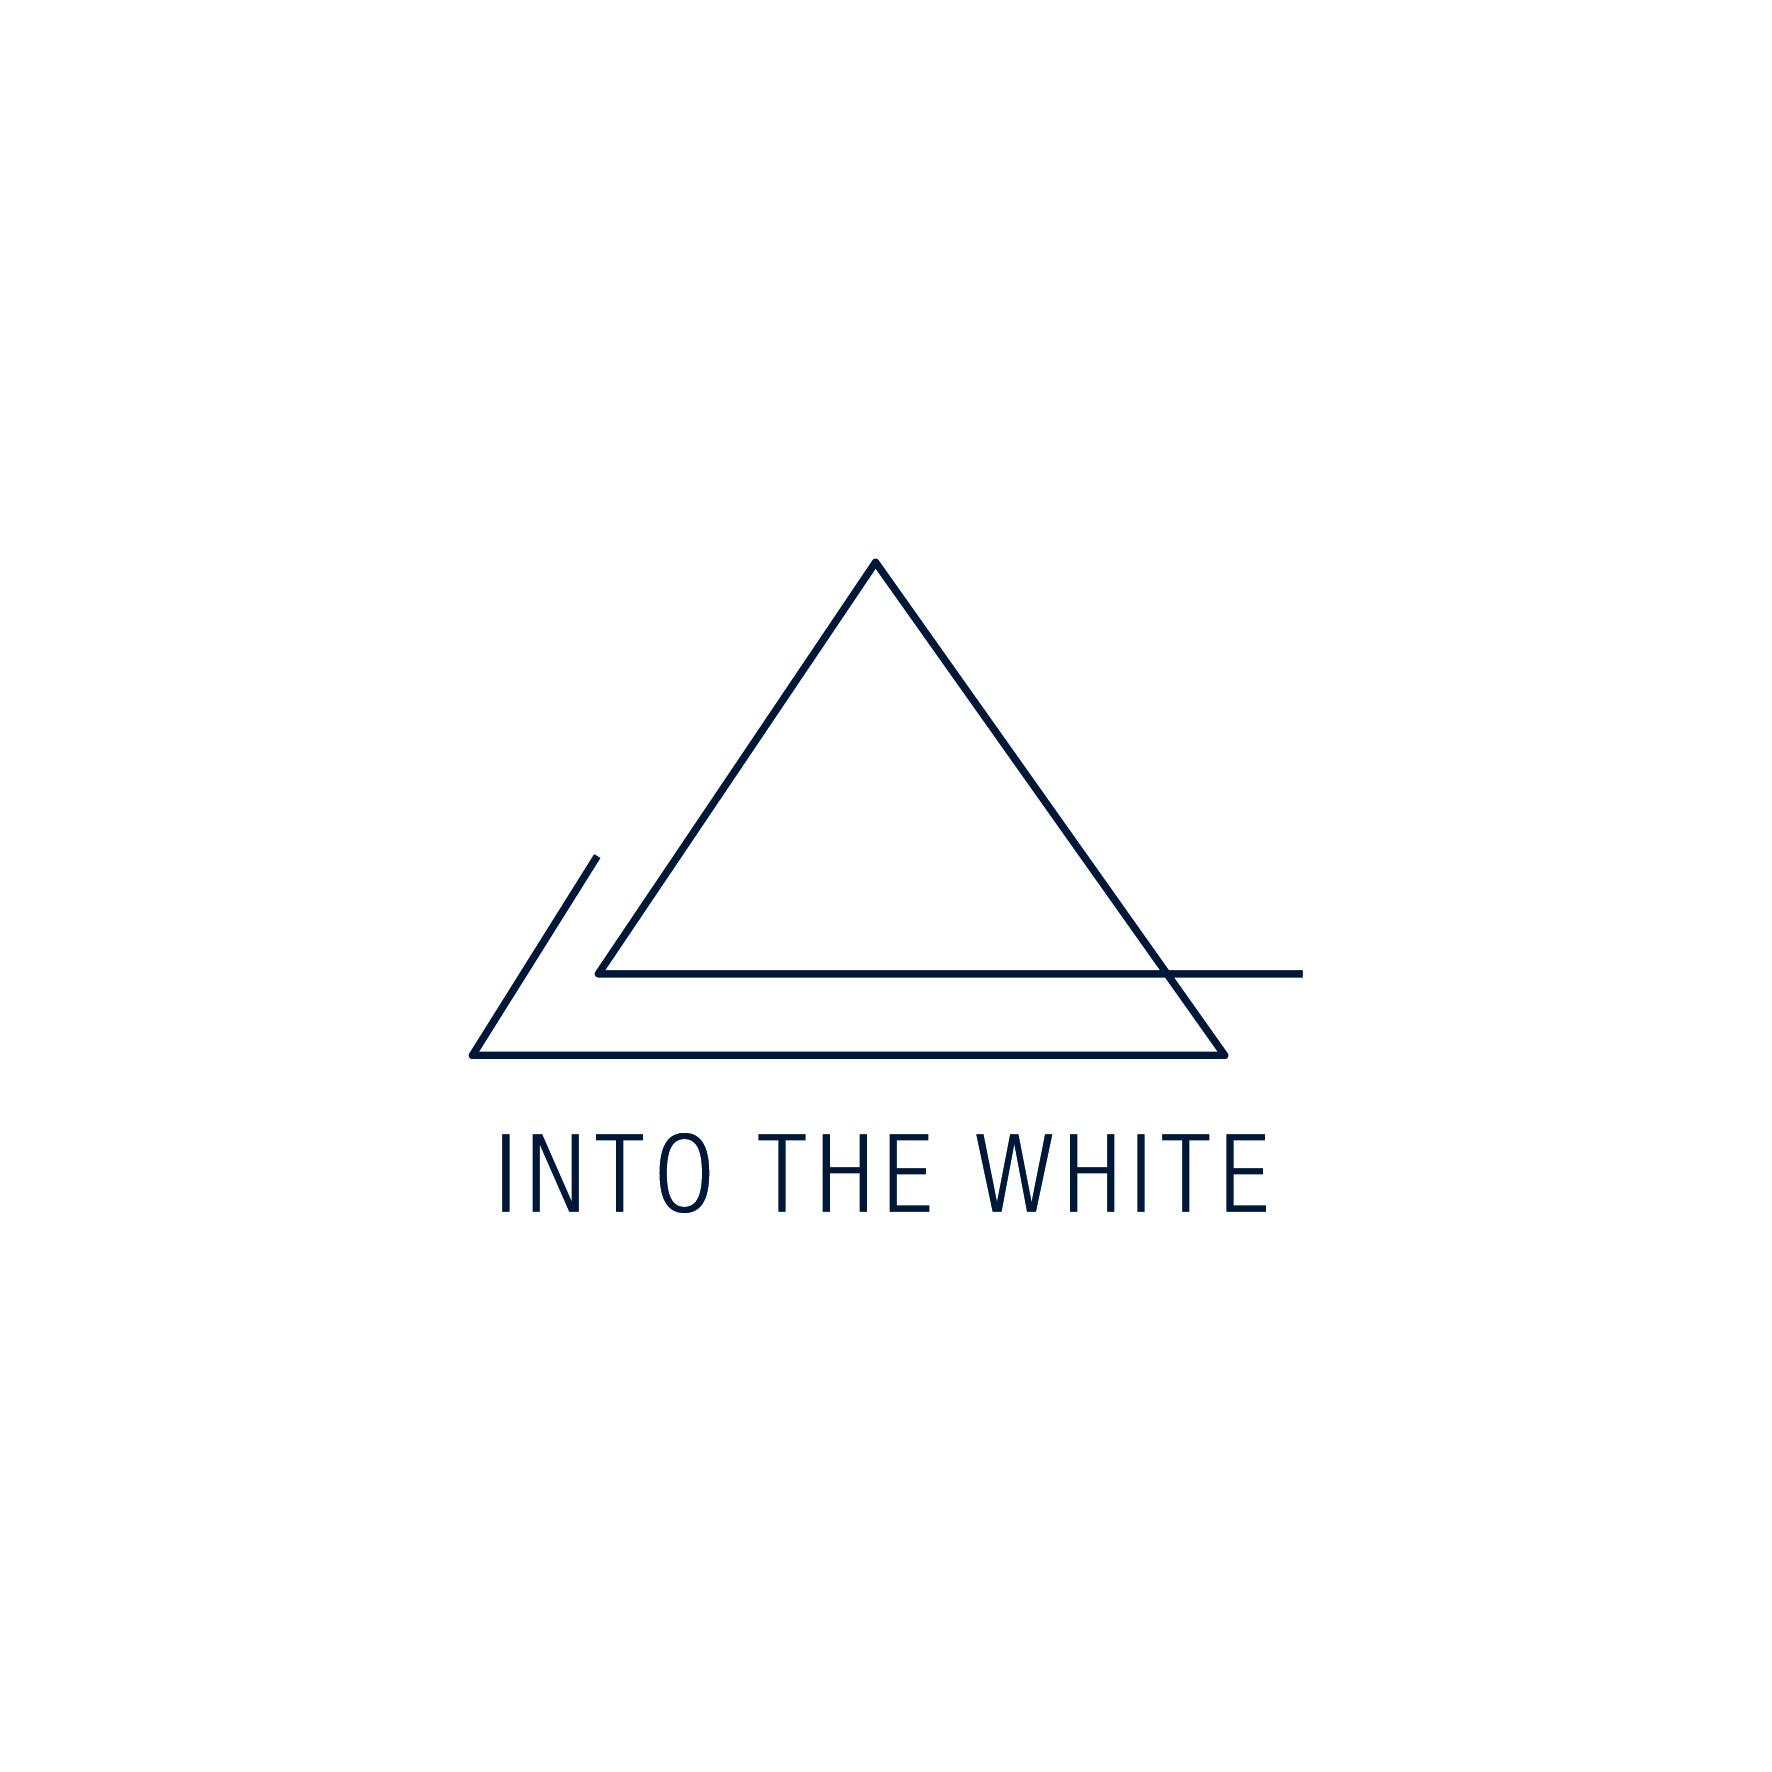 kretz+partners_intothewhite.jpg